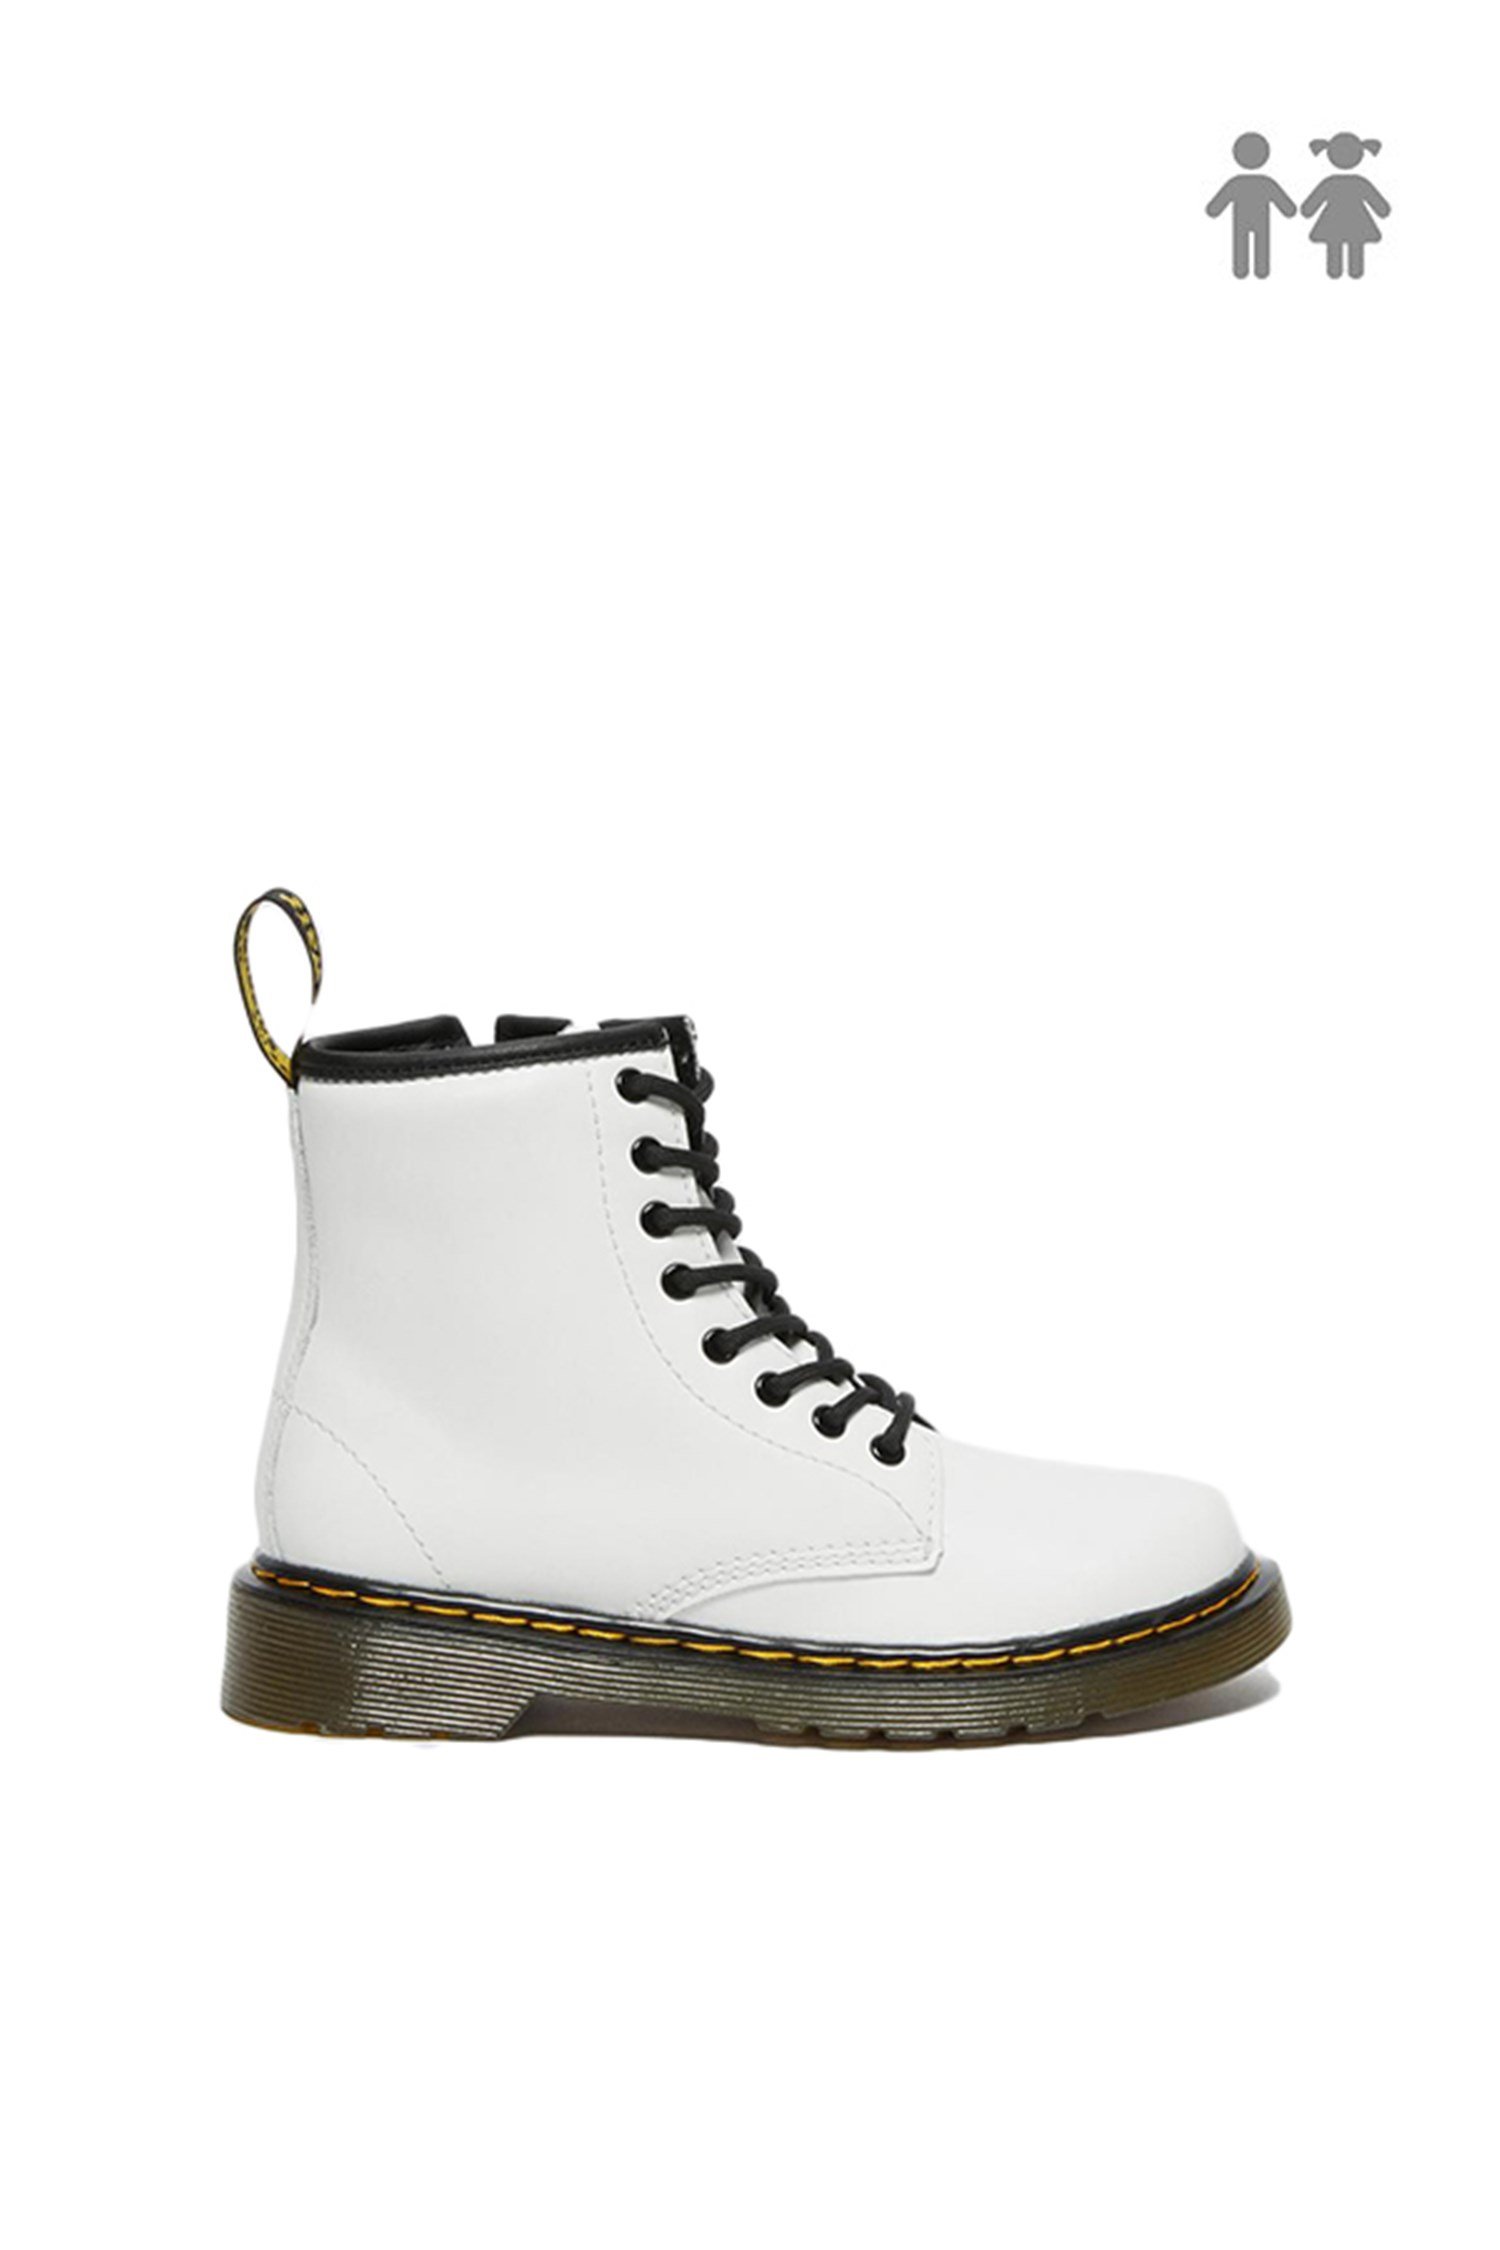 Dr. Martens Boots boots Children